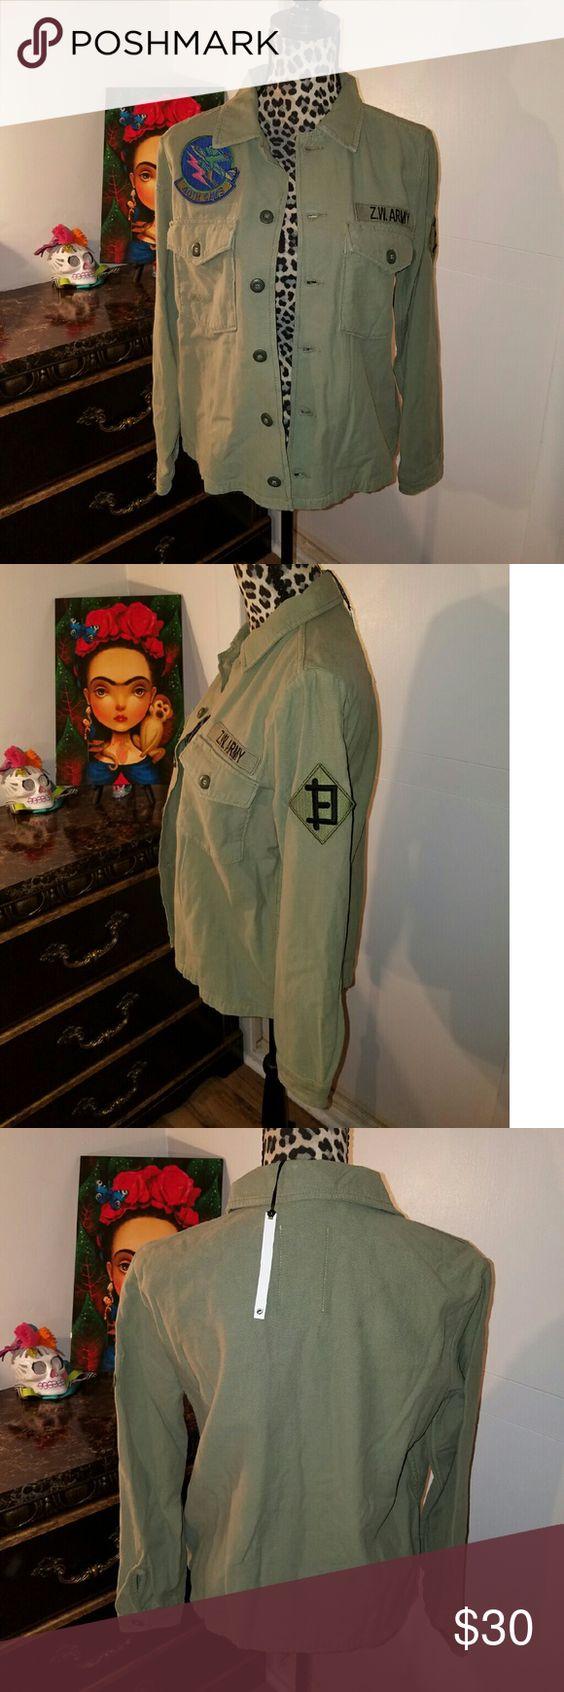 Zara Women's Jacket New Zara women's military style jacket Zara Jackets & Coats